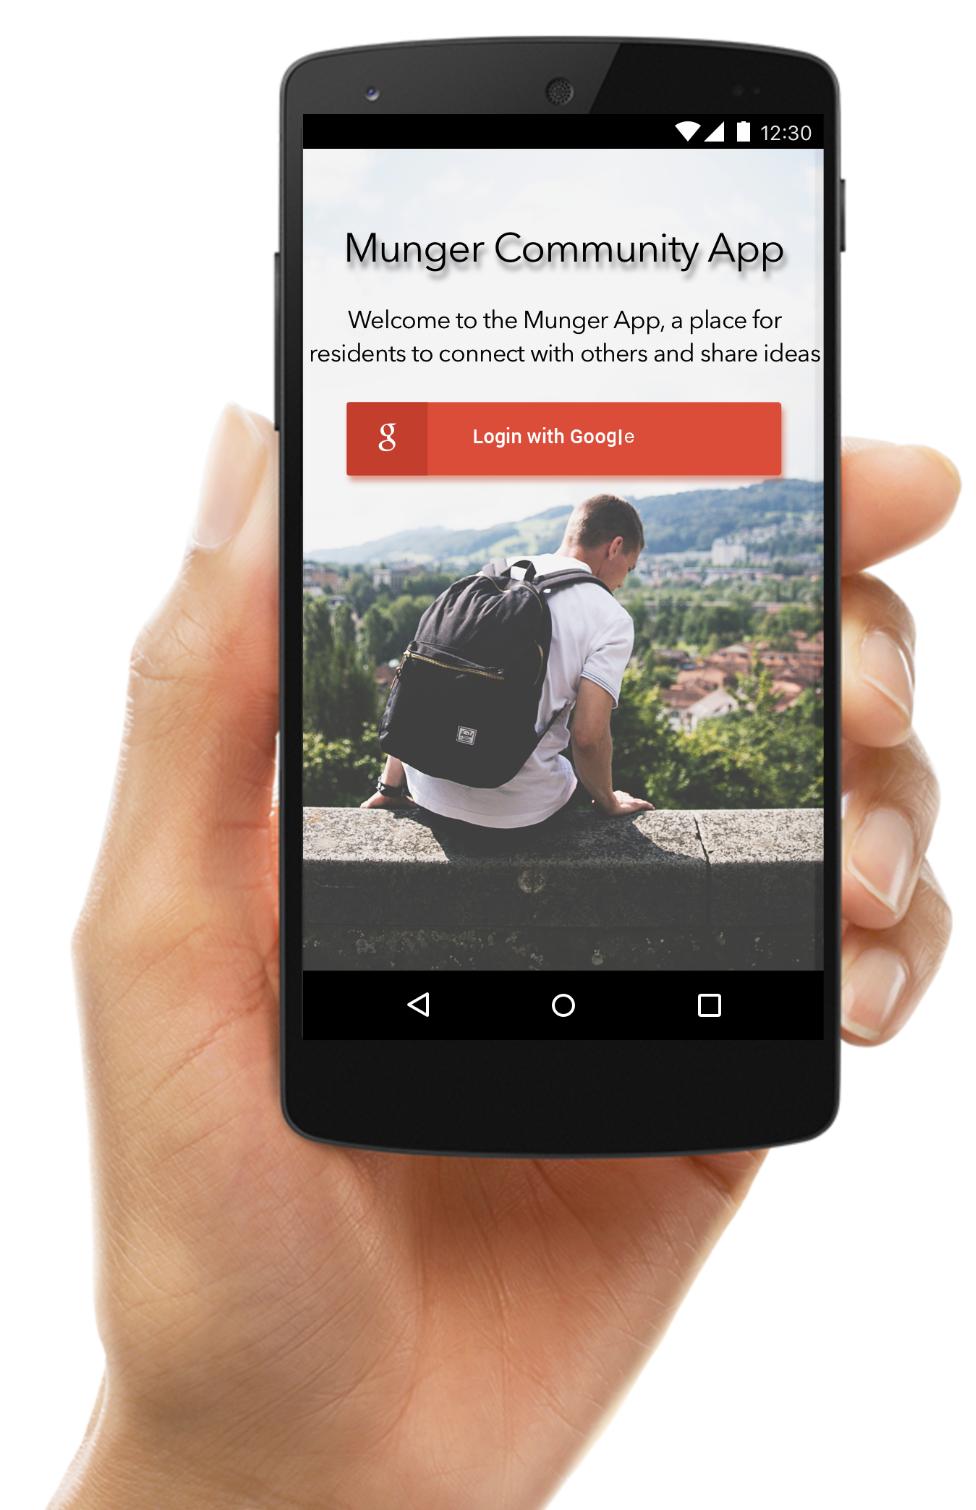 Munger Community App (UX Design)